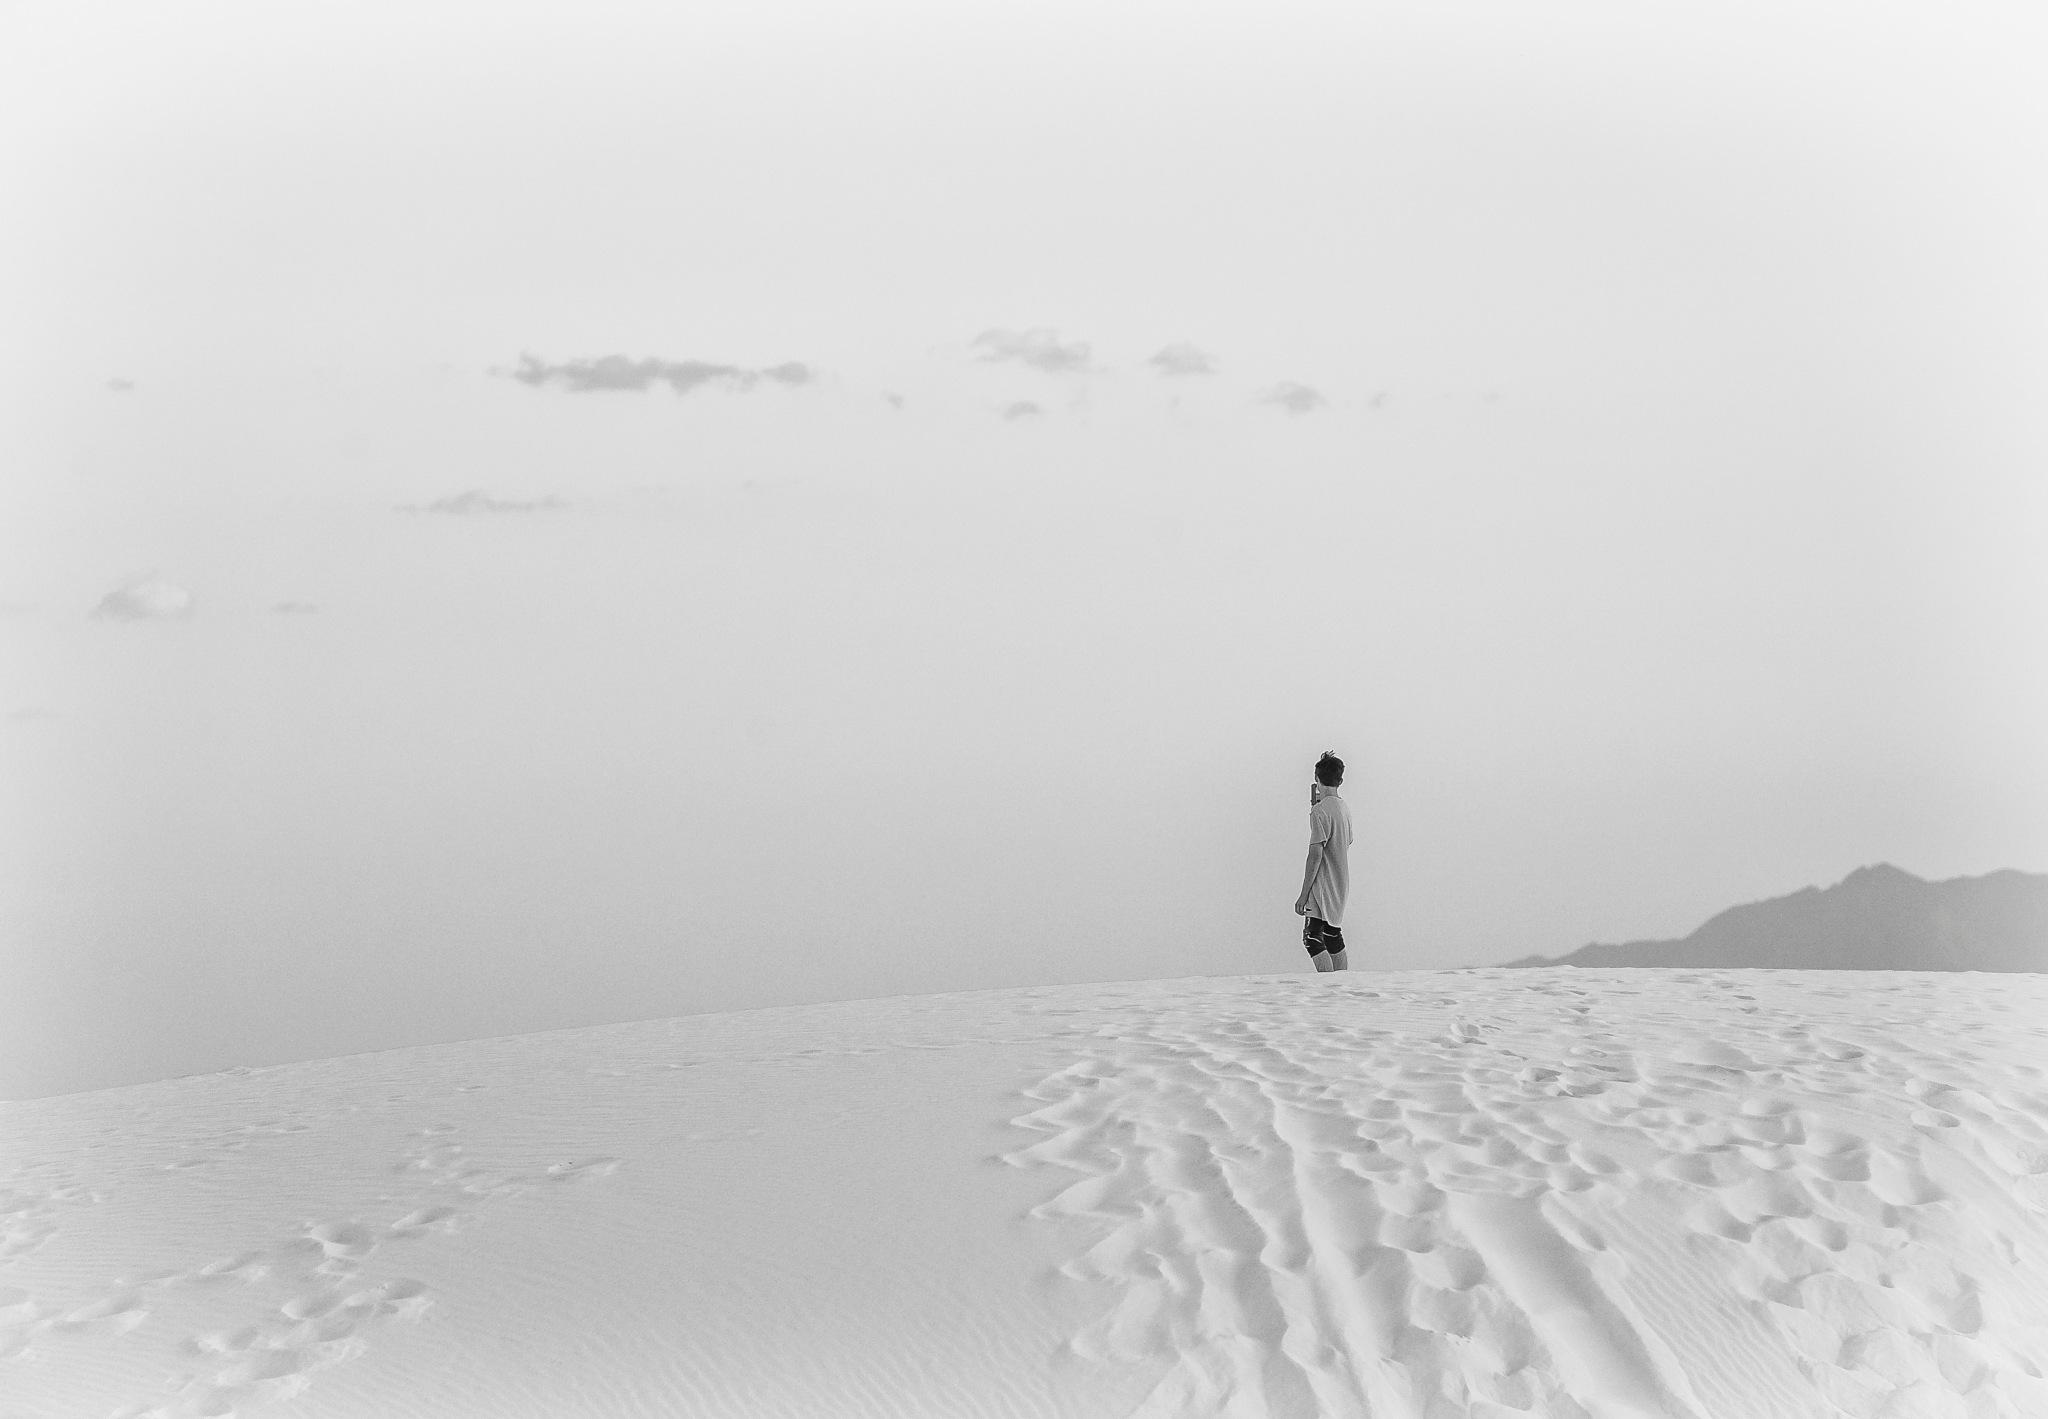 distant by Michael Scott